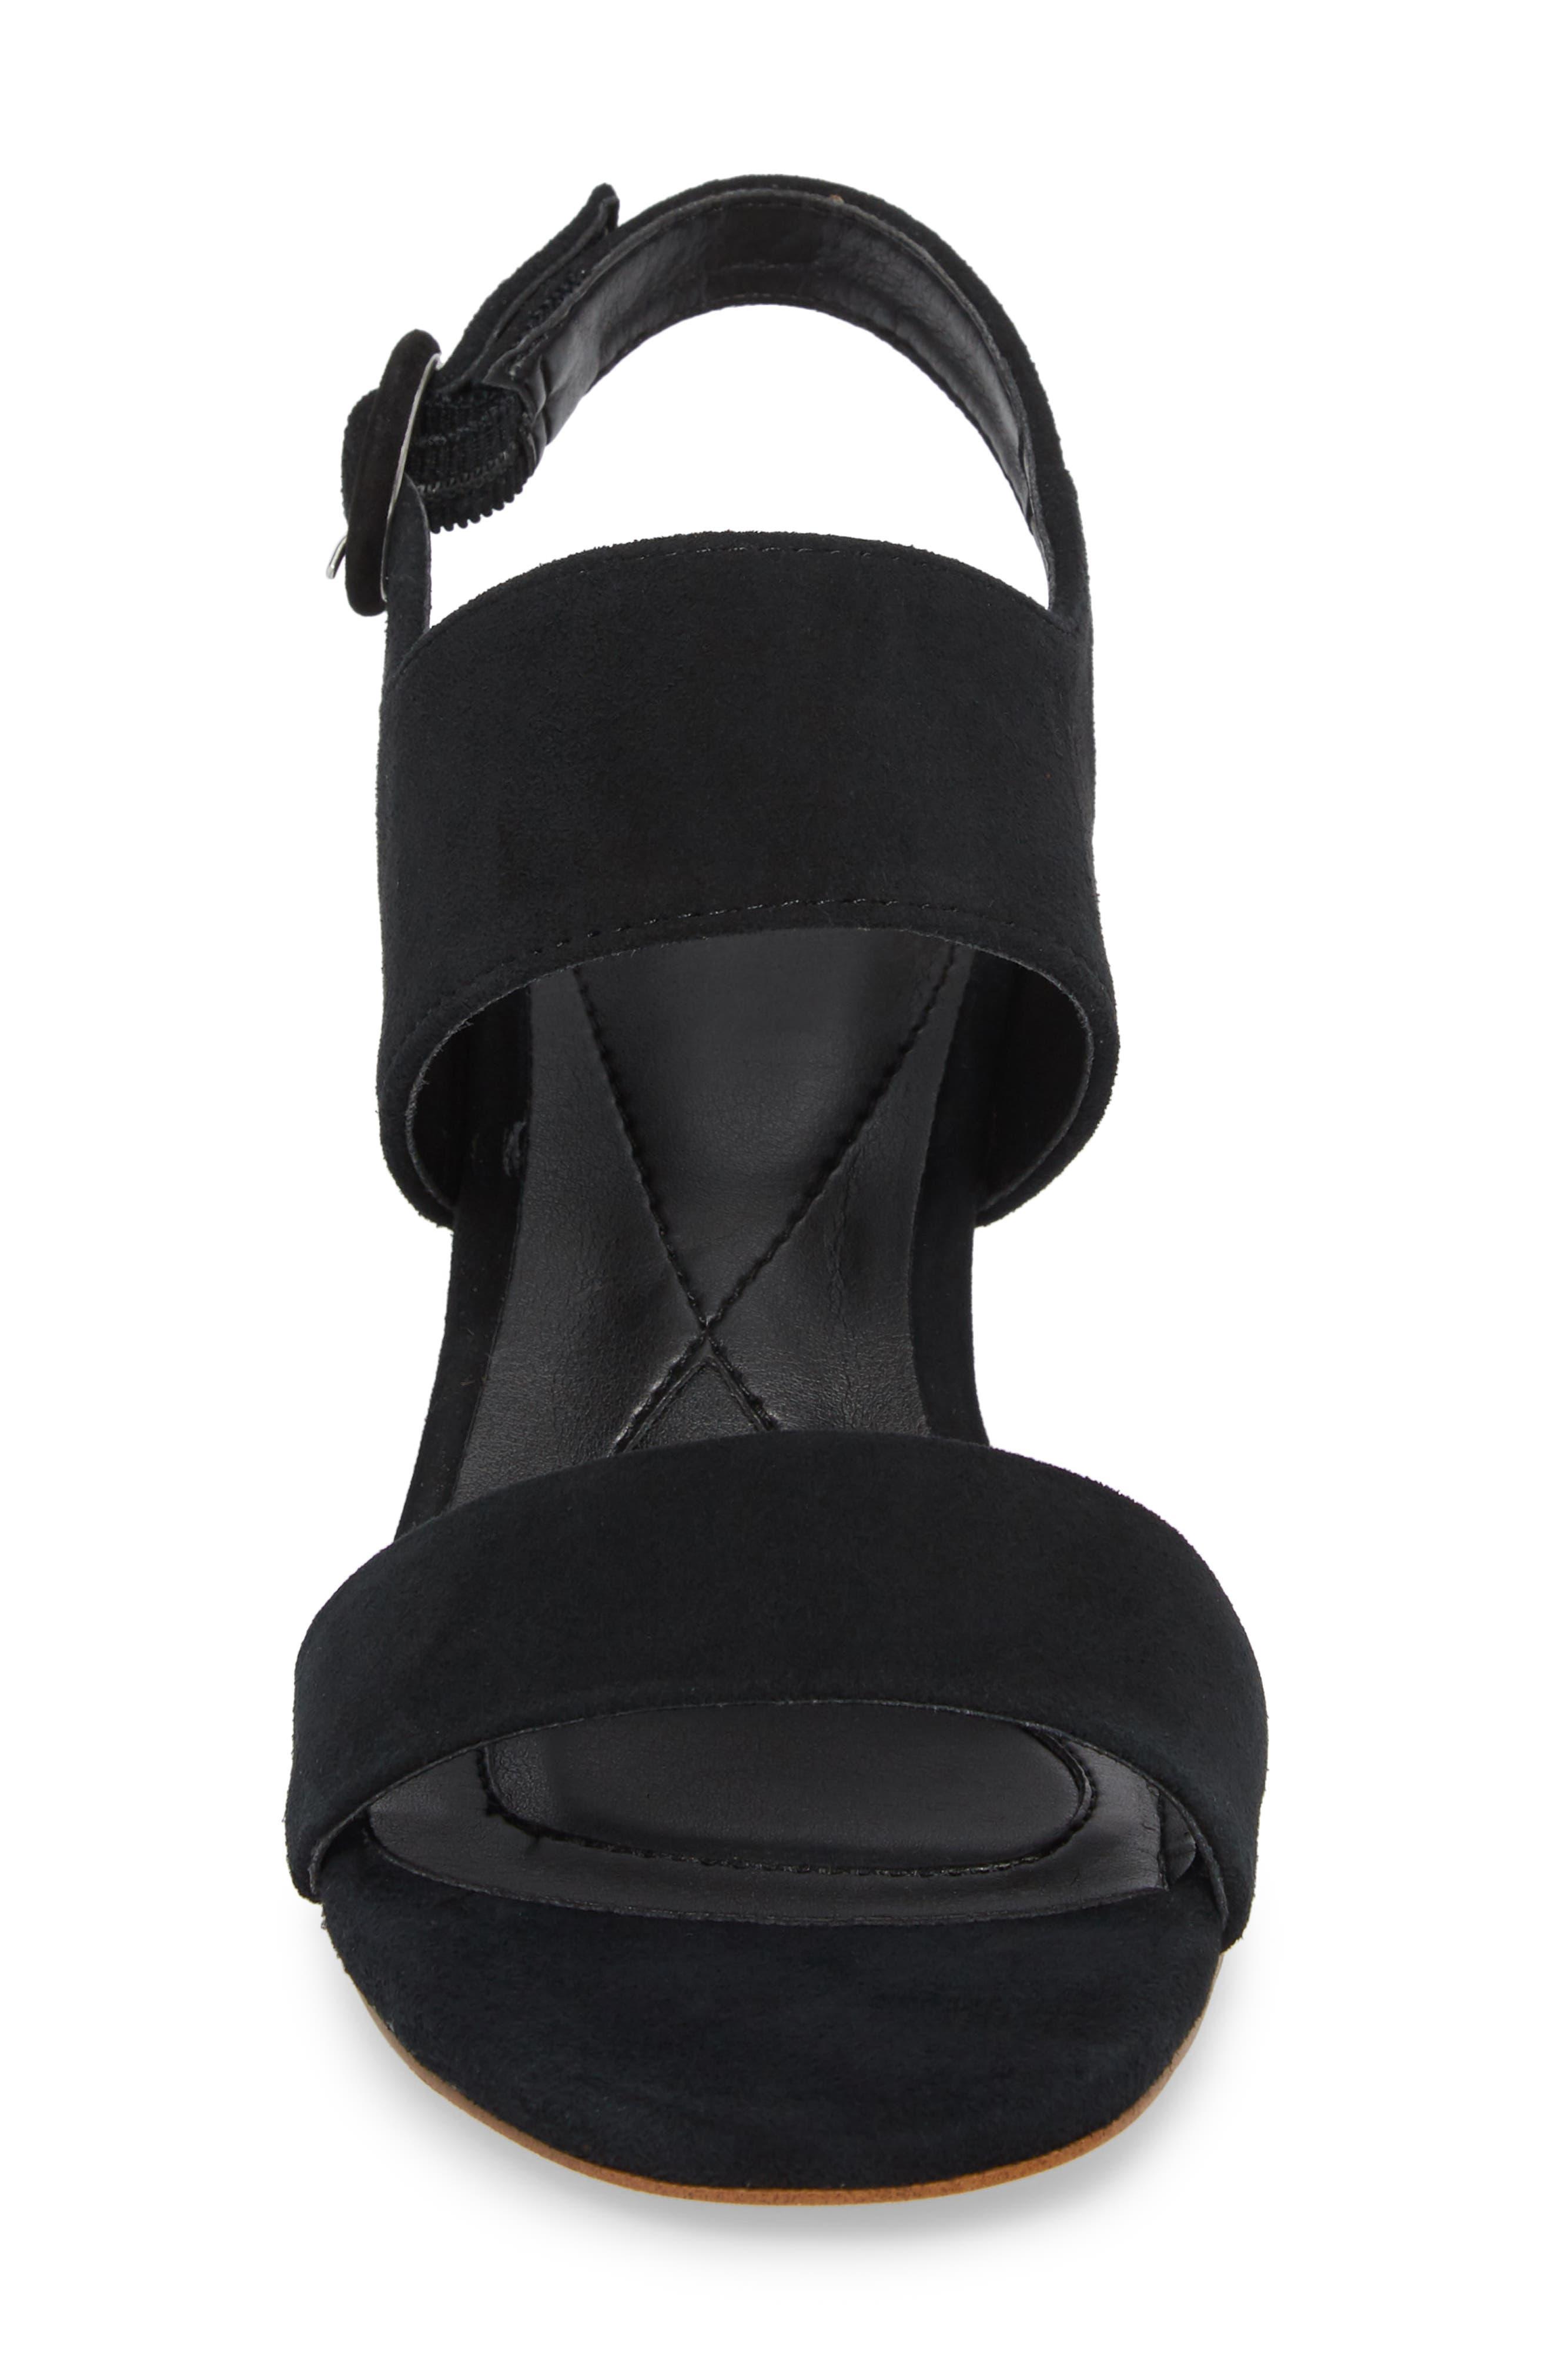 ISOLÁ, Isola Landra Block Heel Sandal, Alternate thumbnail 4, color, BLACK SUEDE